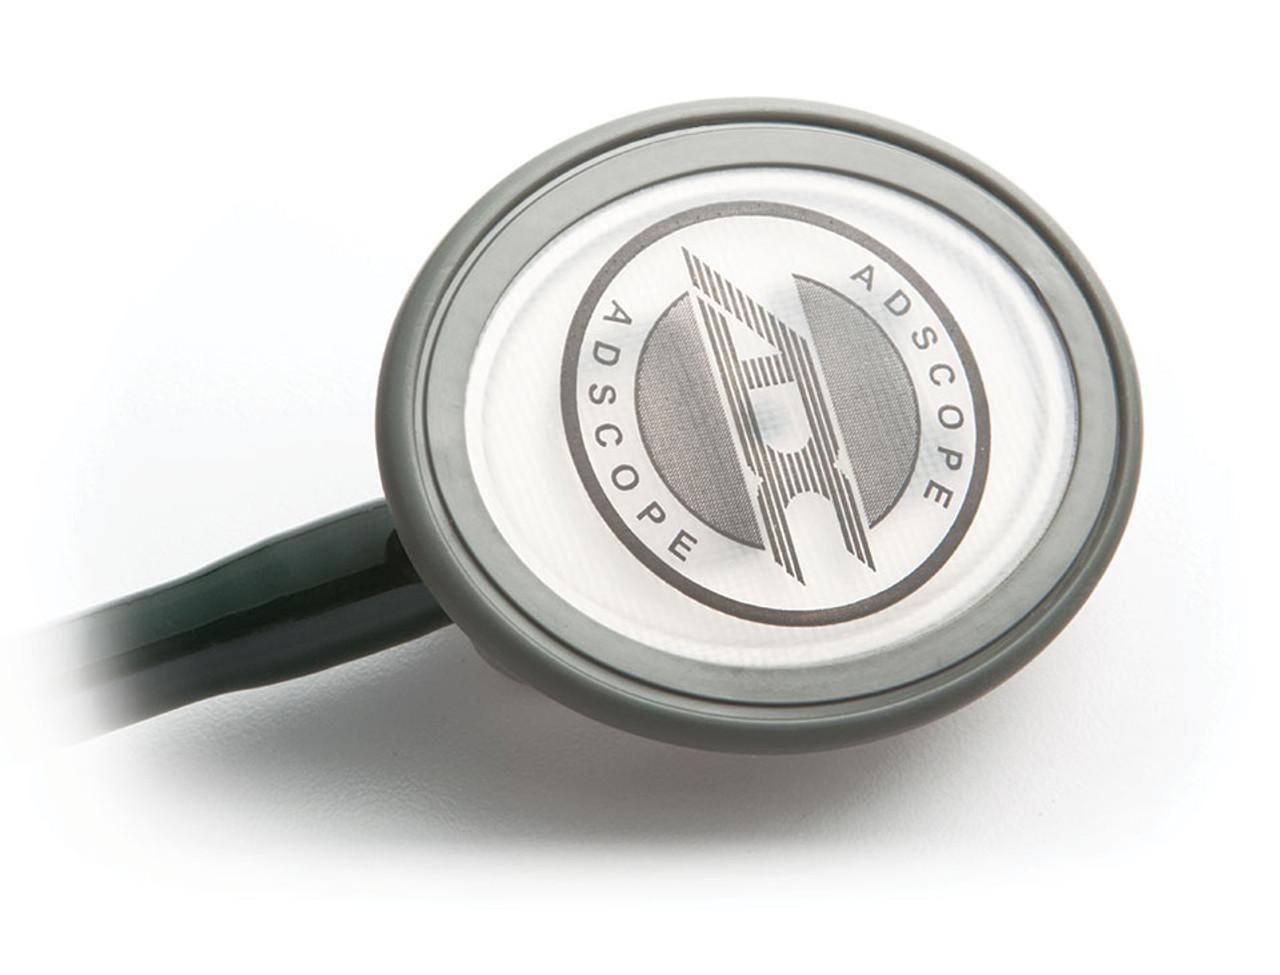 ADC 600 Single Head Advanced Diagnostic Stethoscope, Gold Finish/Black Tubing, 600GP